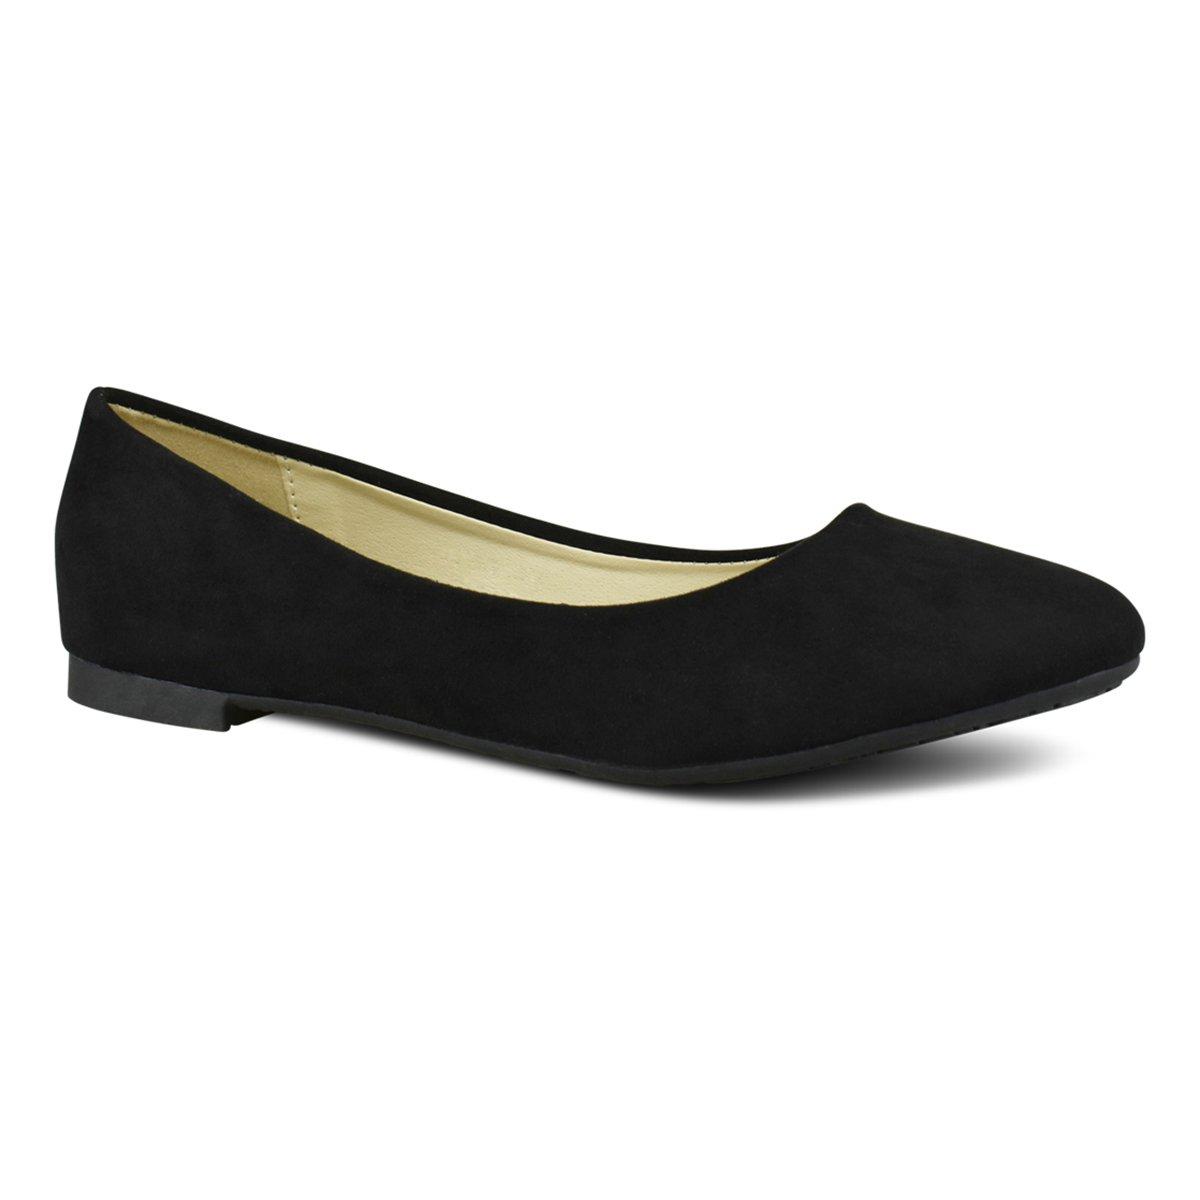 Premier Standard Women's Classic Round Toe Ballerina Walking Slip on Suede Flats Comfortable Closed Toe Ballet